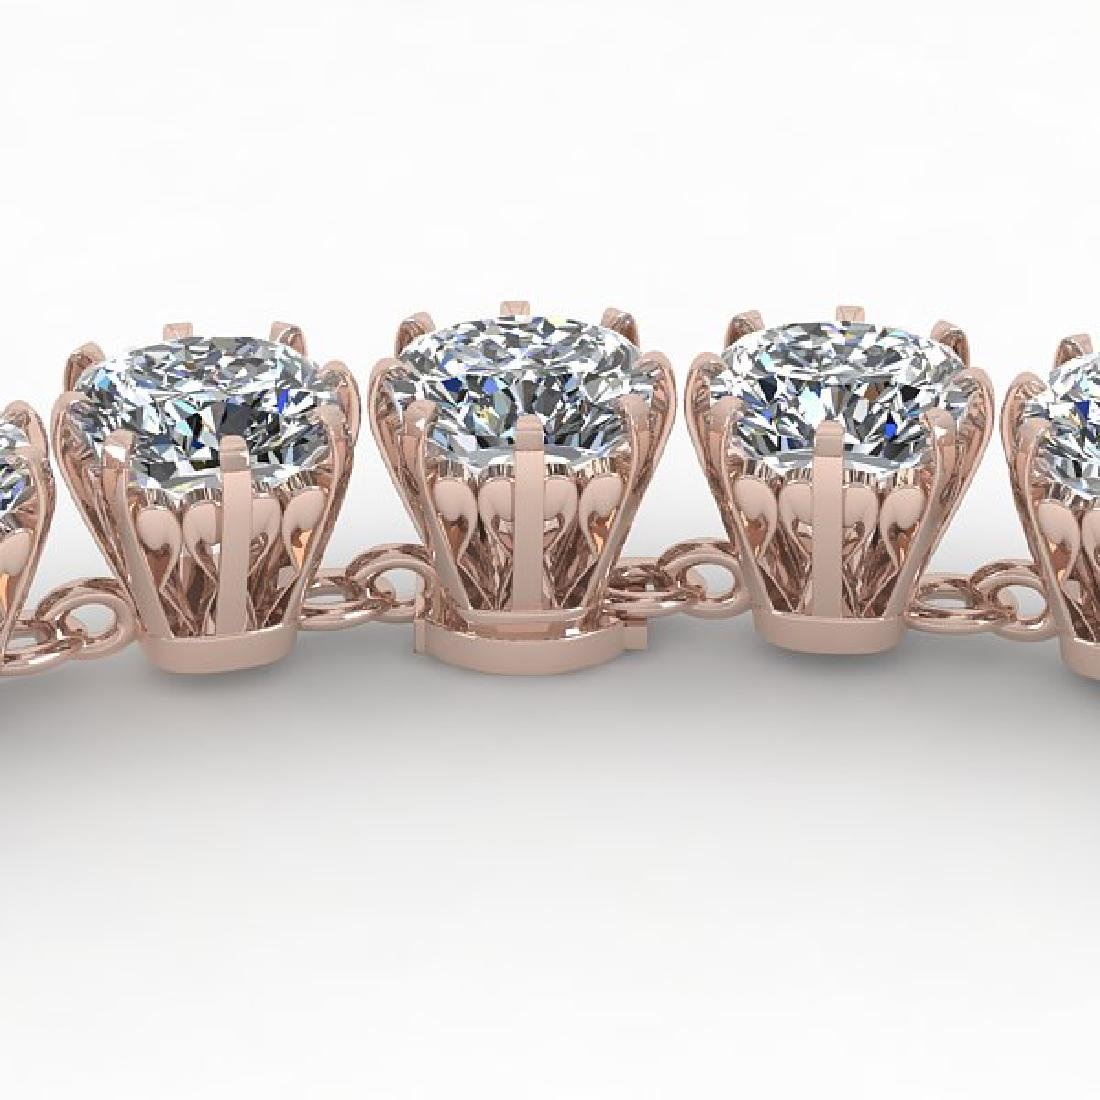 28 CTW Oval Cut SI Certified Diamond Necklace 14K Rose